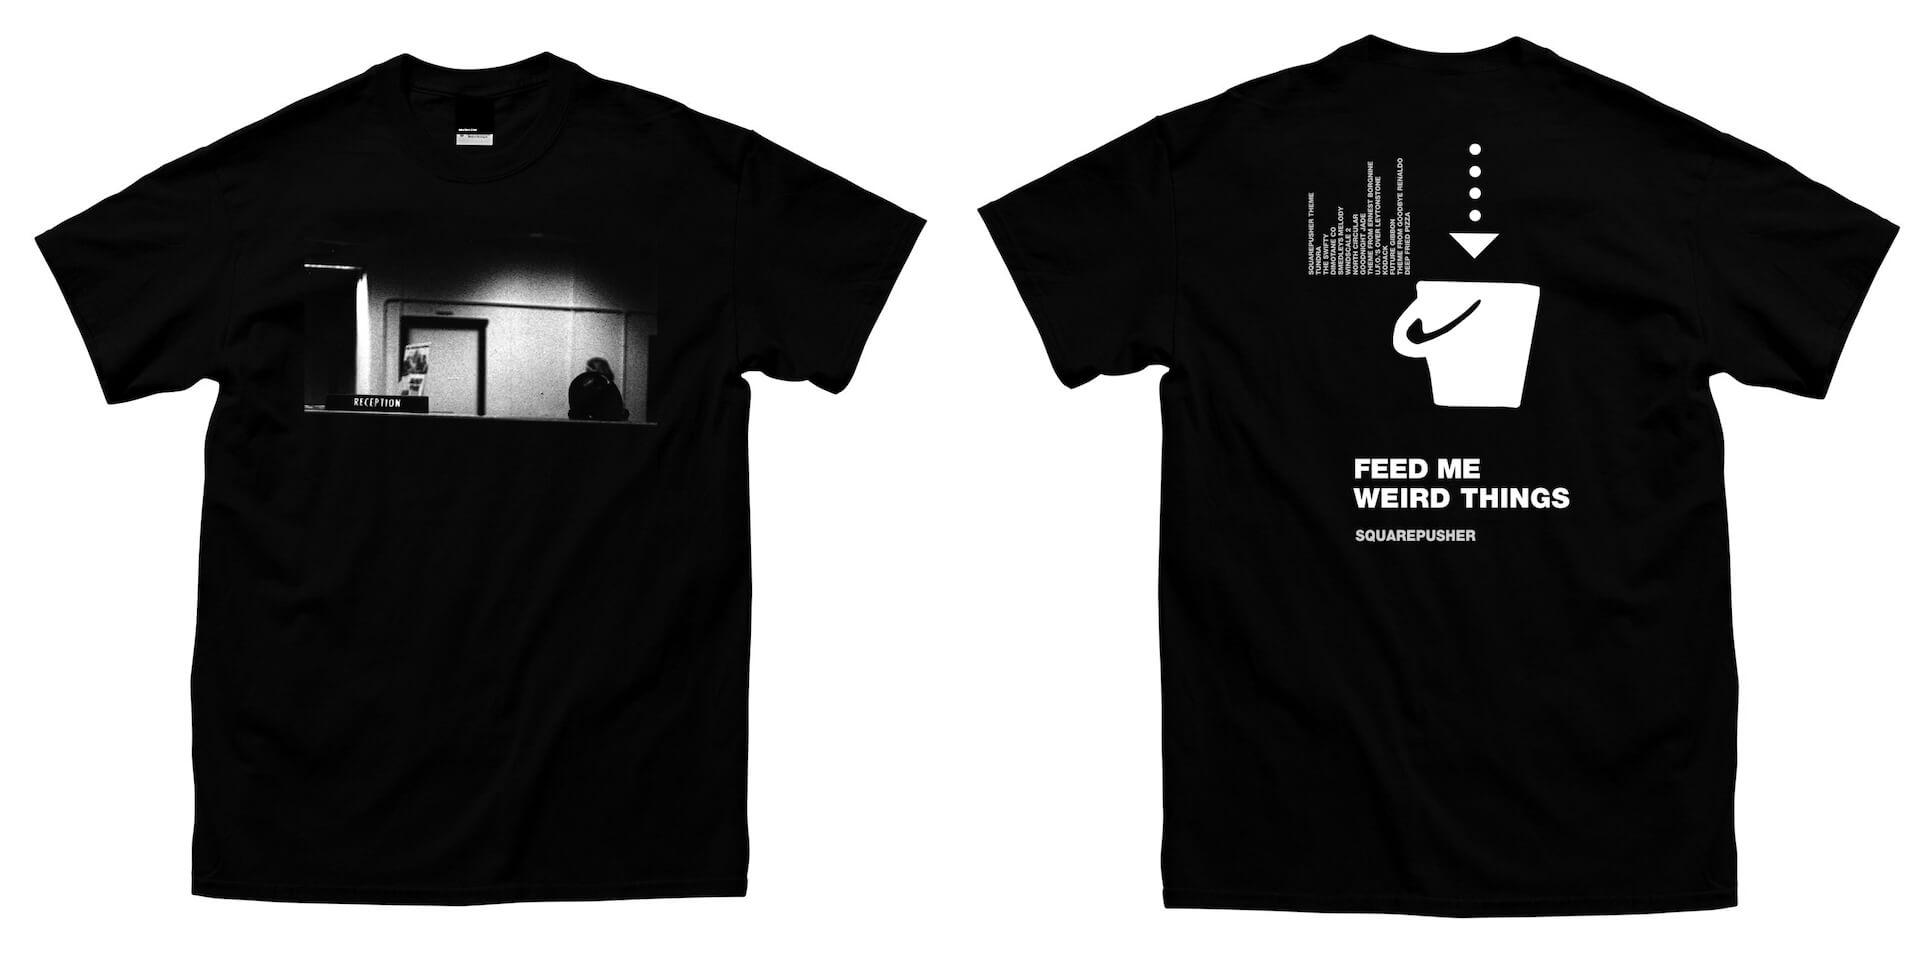 Squarepusherデビューアルバム『Feed Me Weird Things』再発盤が本日ついに発売!待望のサブスクも解禁 music210604_squarepusher_10